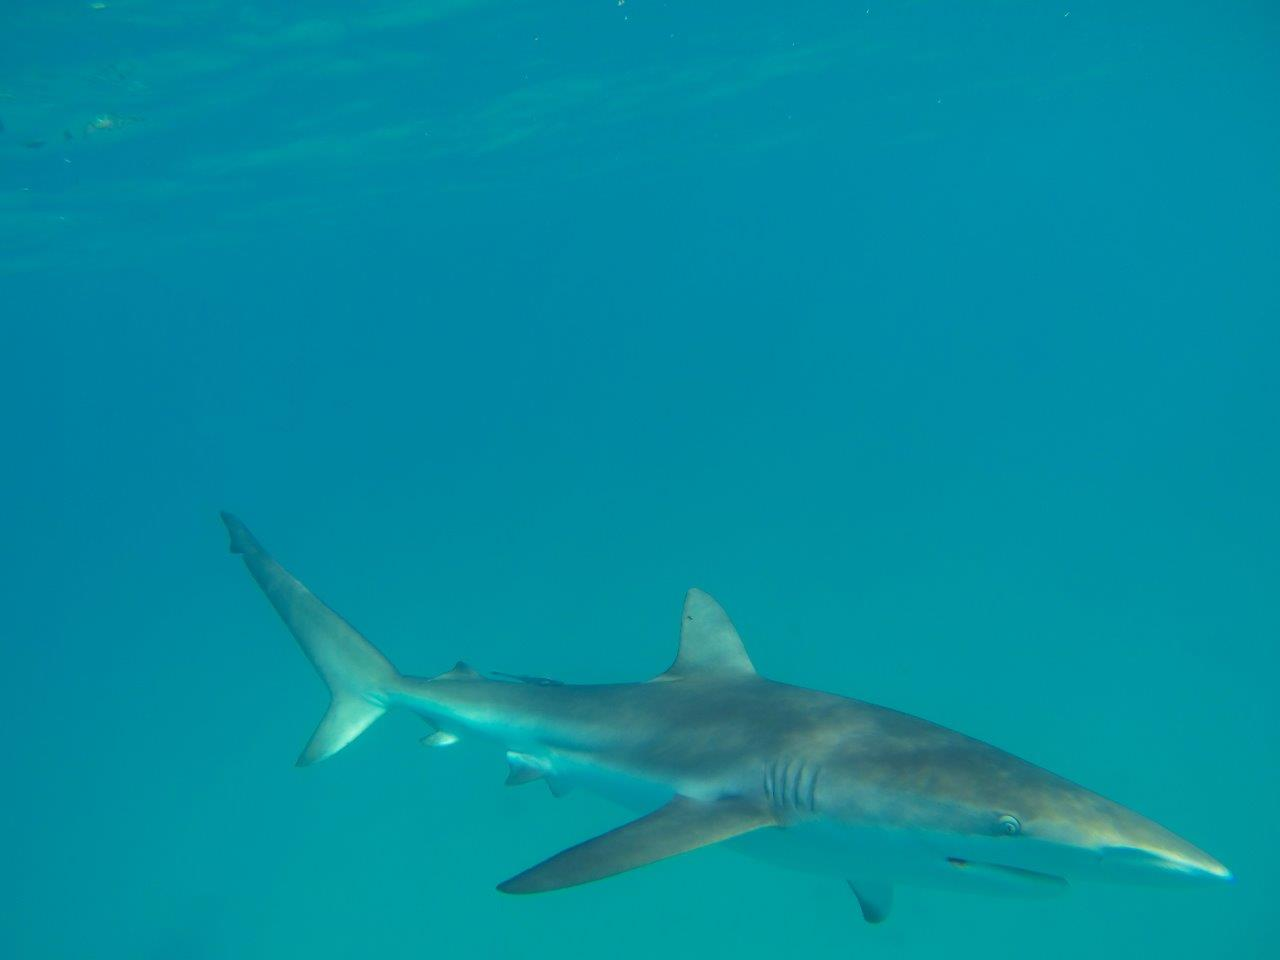 Shelter Bay at Steep Point Sharks